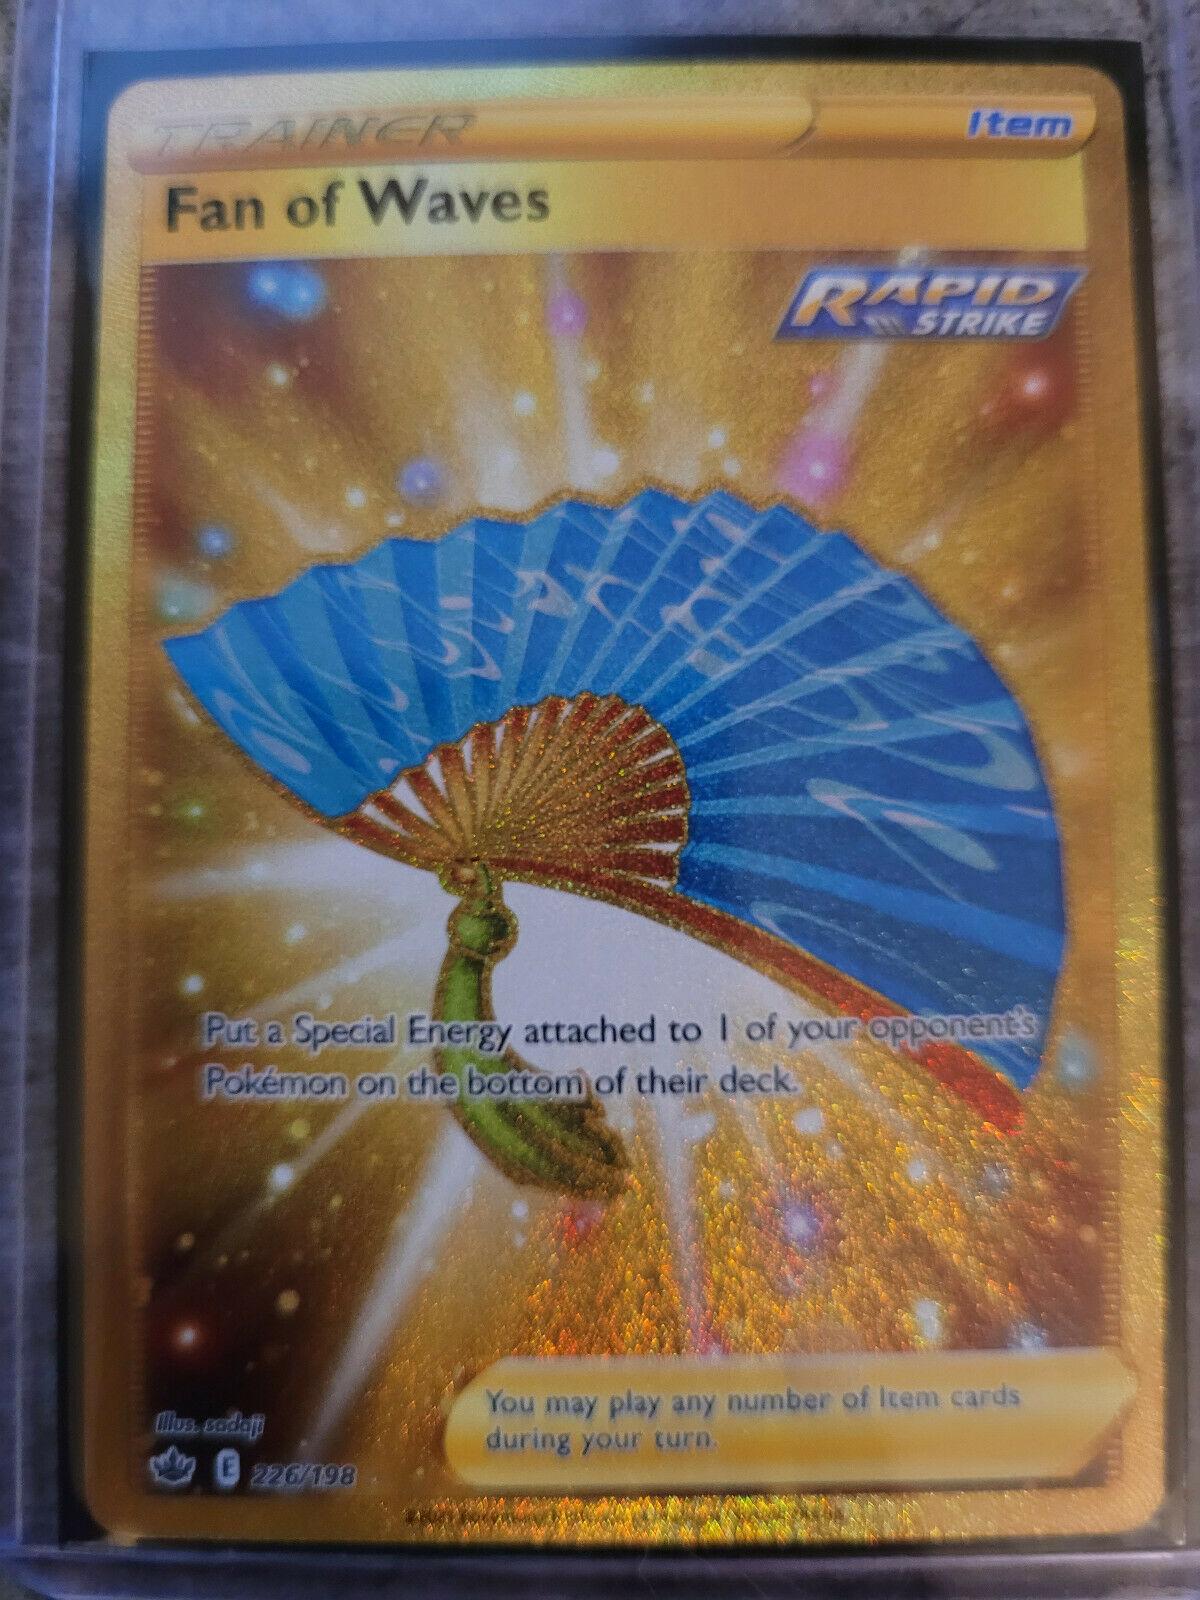 Fan of Waves 226/198 Gold Rare Chilling Reign Pokemon Card Mint/Near Mint